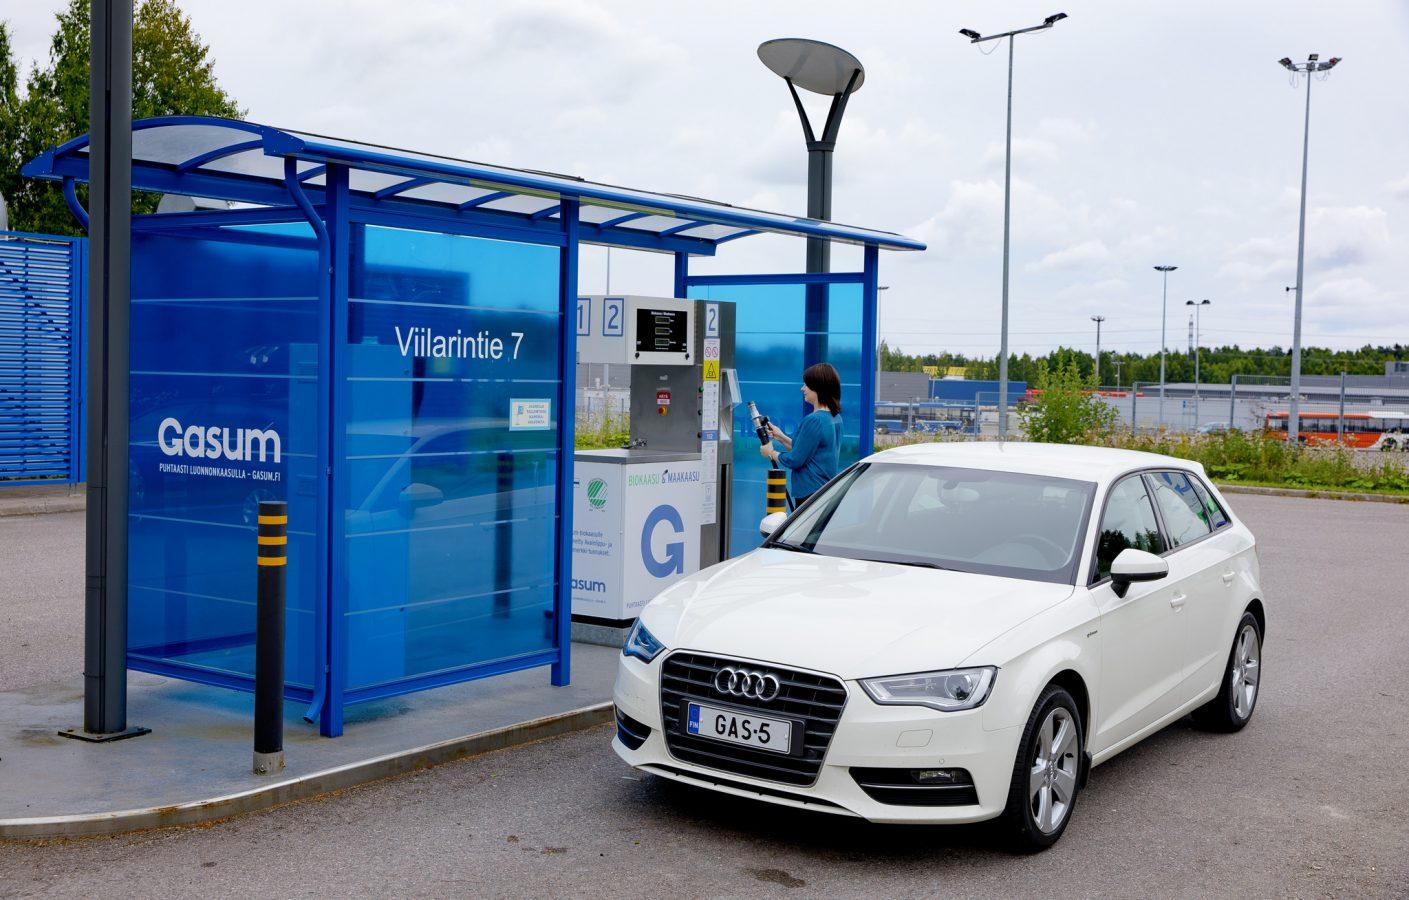 Gasum biogas station.